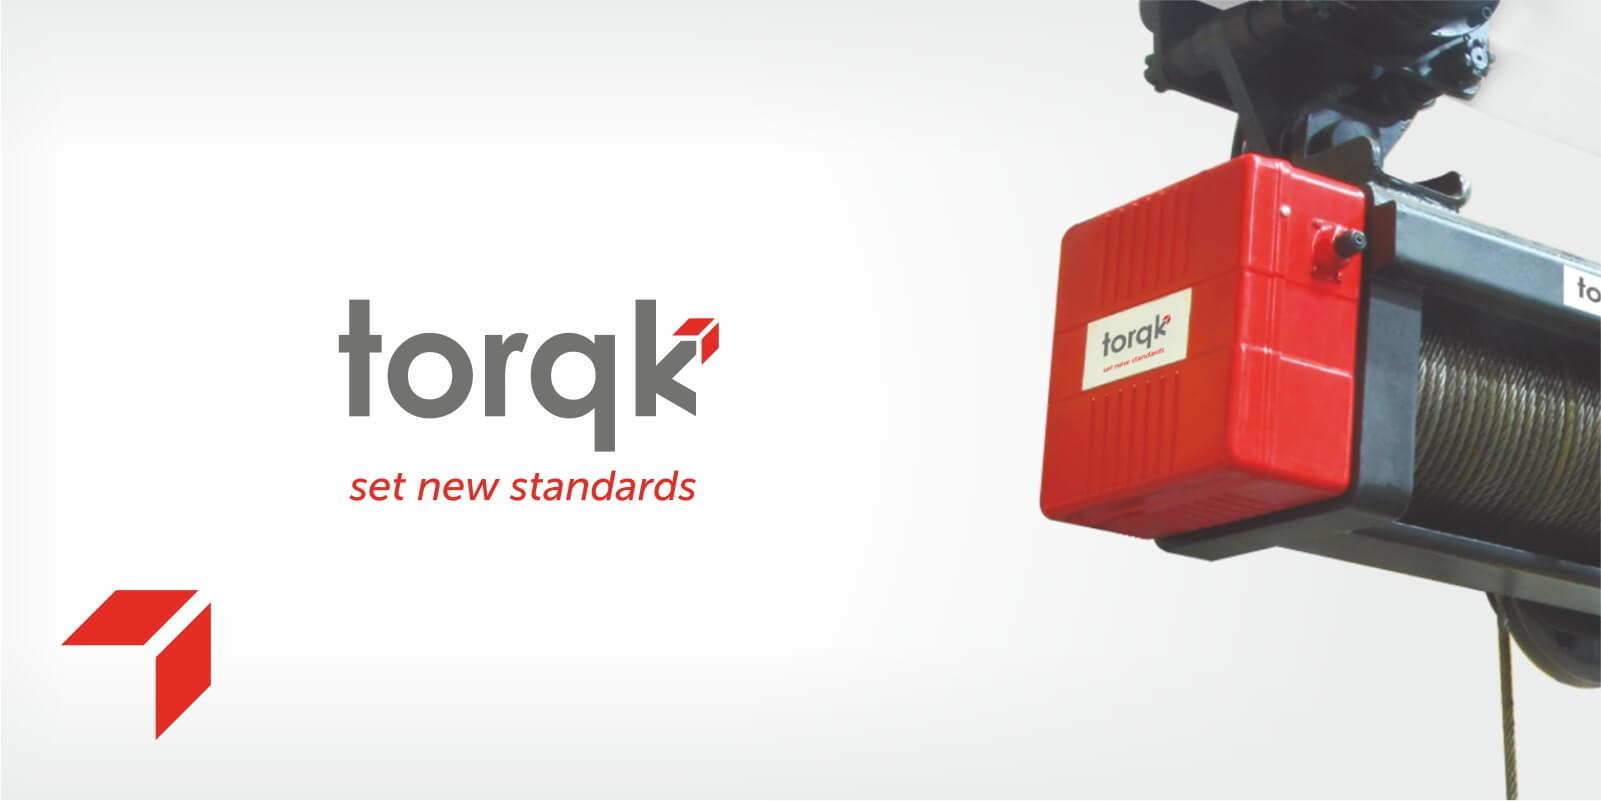 torqk-b2b-branding